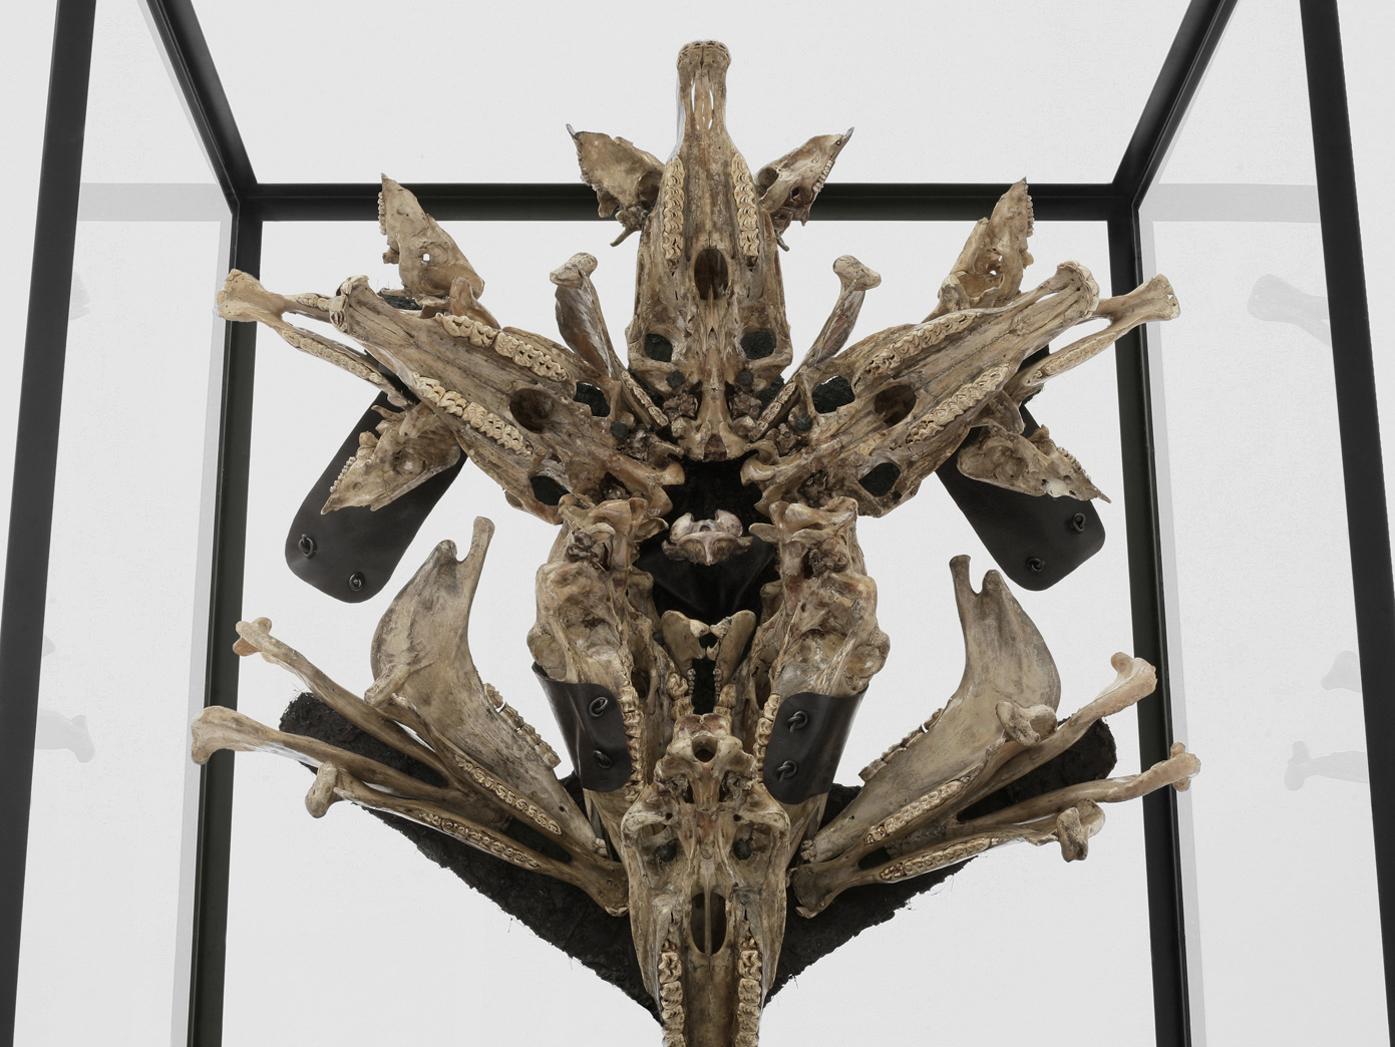 POSSESIA / Triumphant (detail) 2010 / 120 x 250 x 90 cm / horse skulls, pig skulls, wood, leather, steel, weights, fur, soil,  resin, enamel